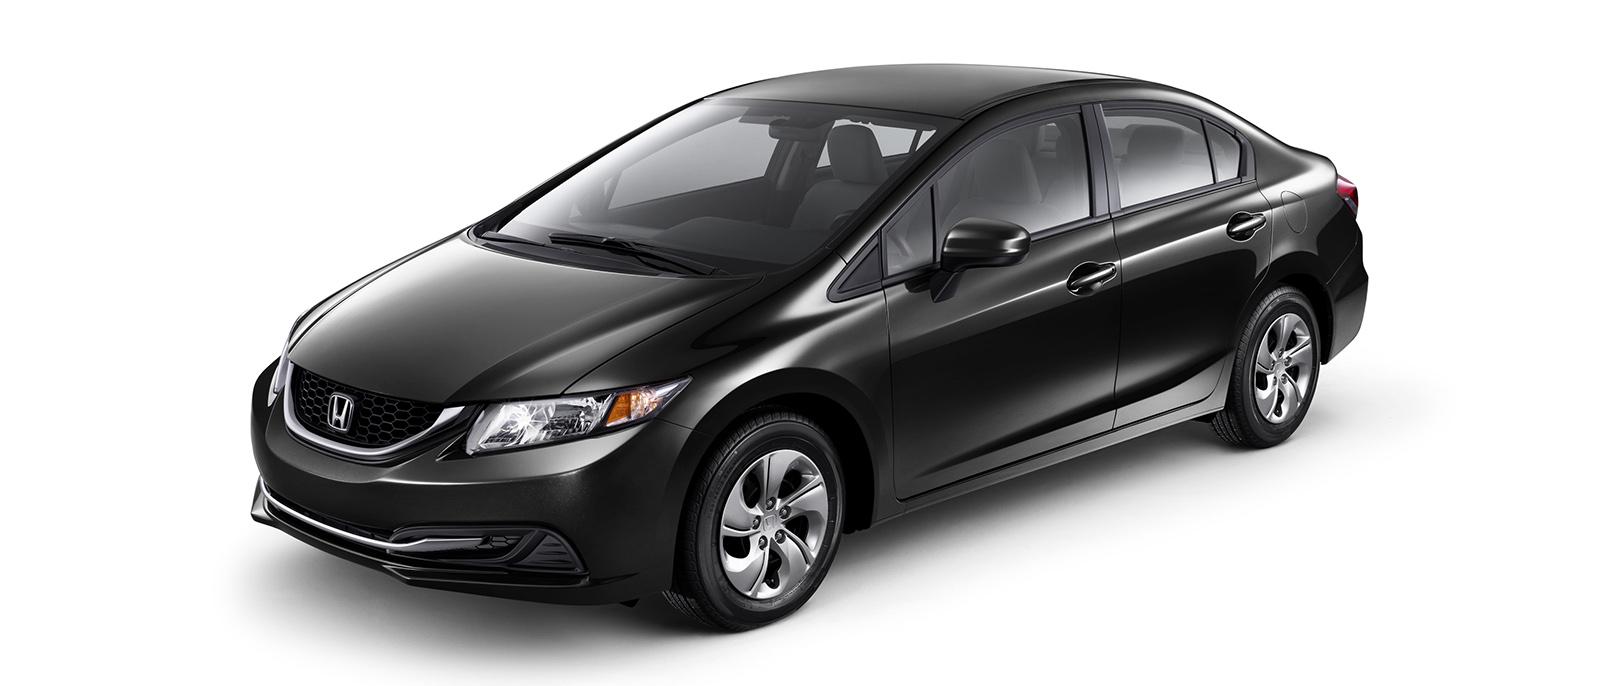 Certified Pre Owned Honda >> 2014 Honda Civic | New England Honda Dealers Association